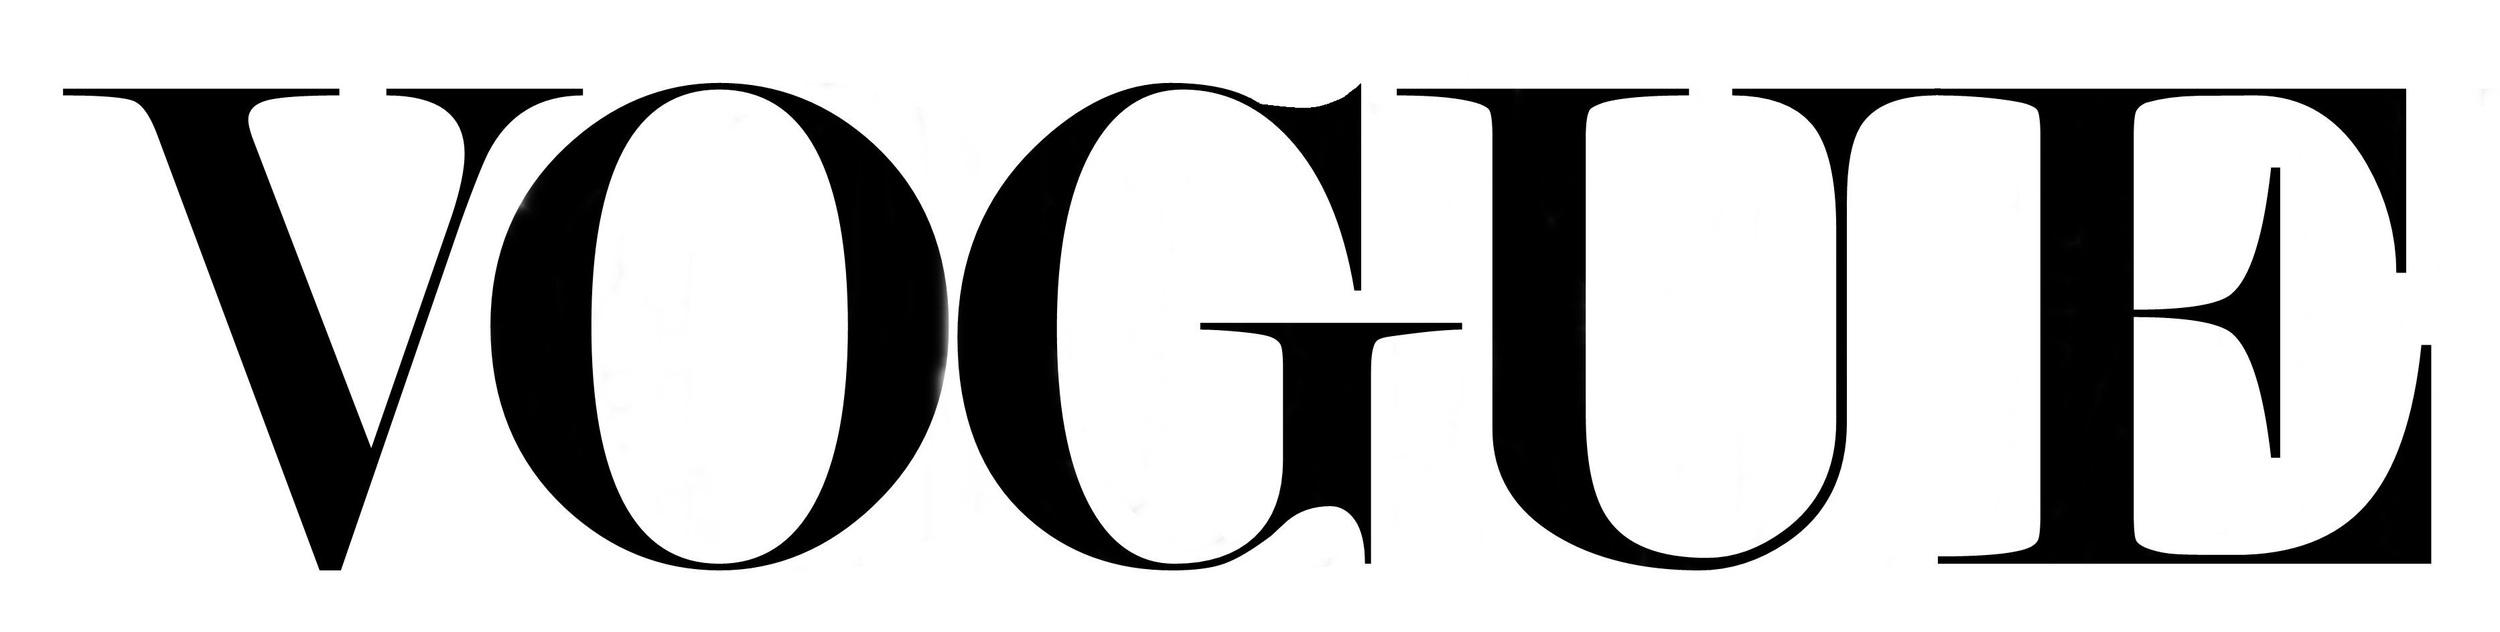 vogue-logo-wallpaperjpg-logo.jpg